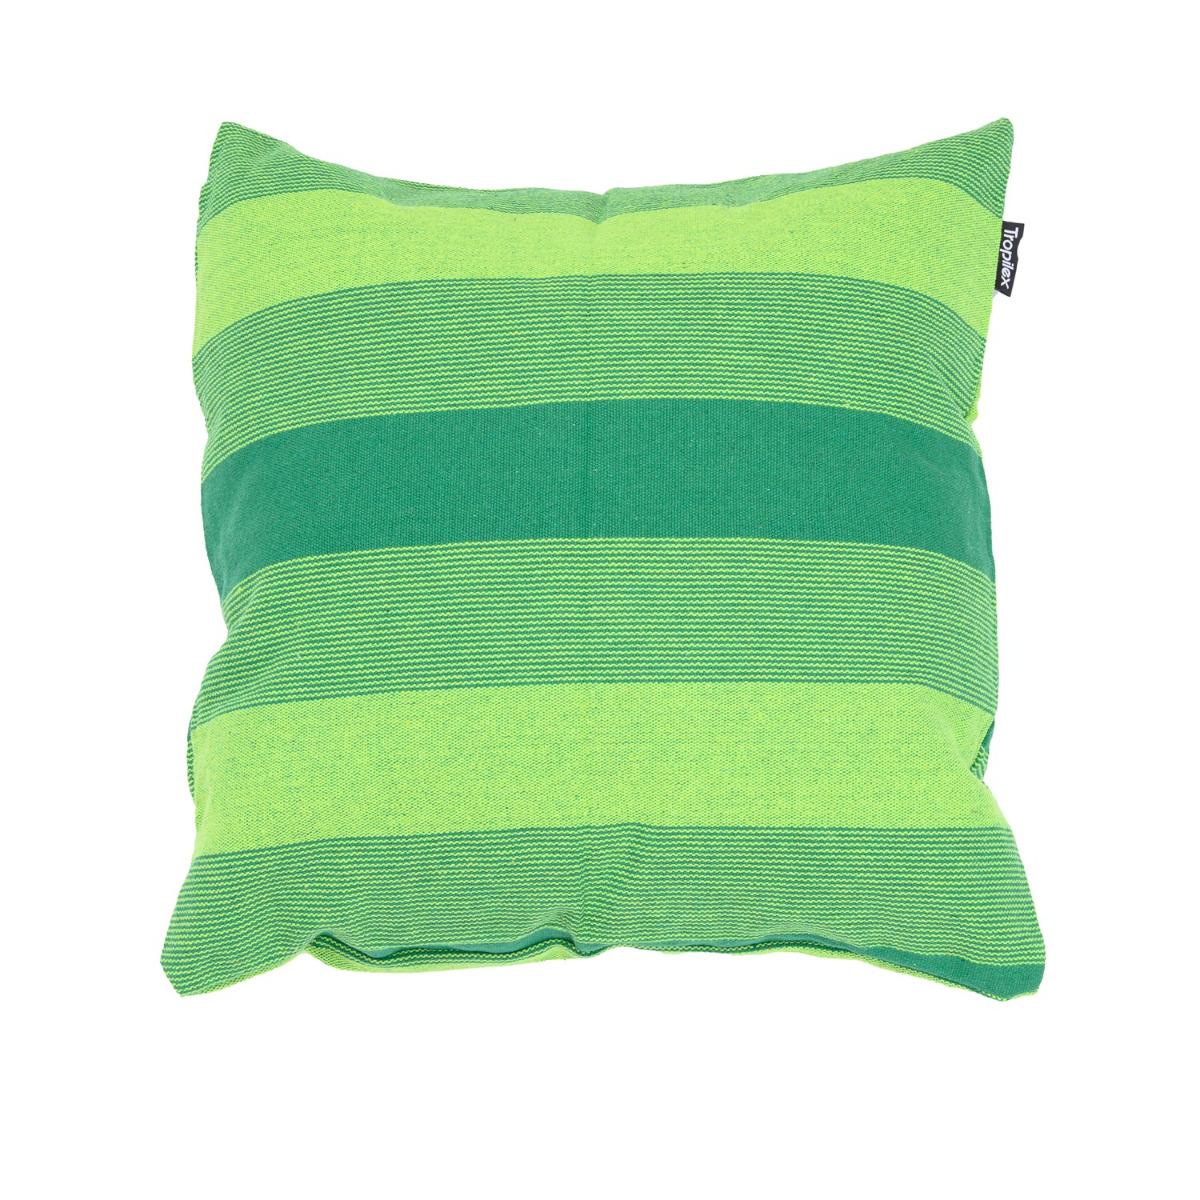 Kussen 'Dream' Green - Groen - Tropilex �